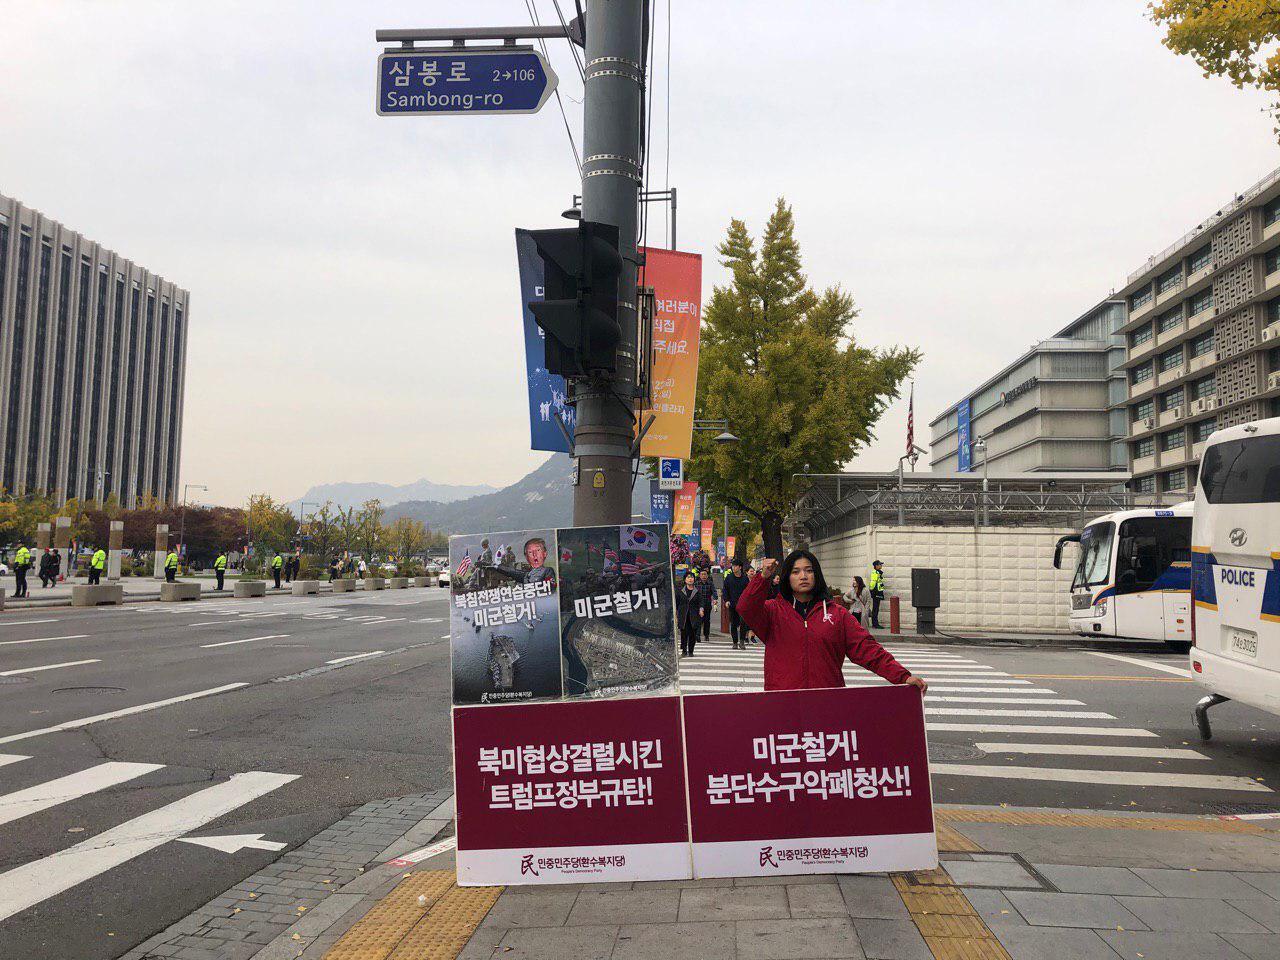 photo_2019-11-06_09-44-30.jpg